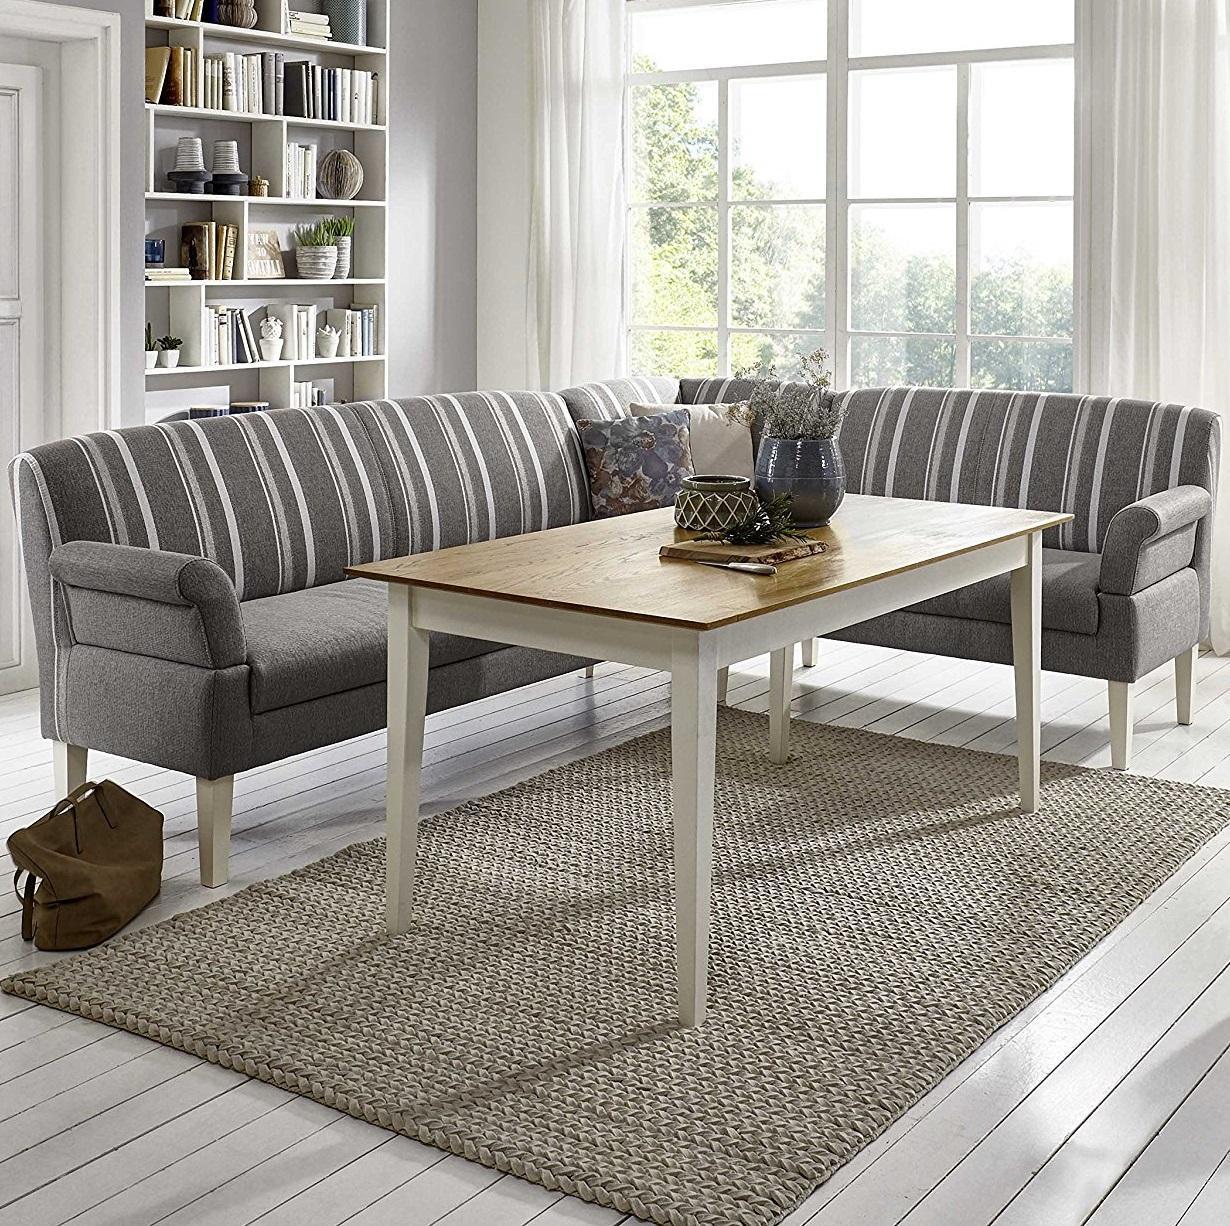 cavadore 2er sofa malm f r k che esszimmer oder wohnk che. Black Bedroom Furniture Sets. Home Design Ideas